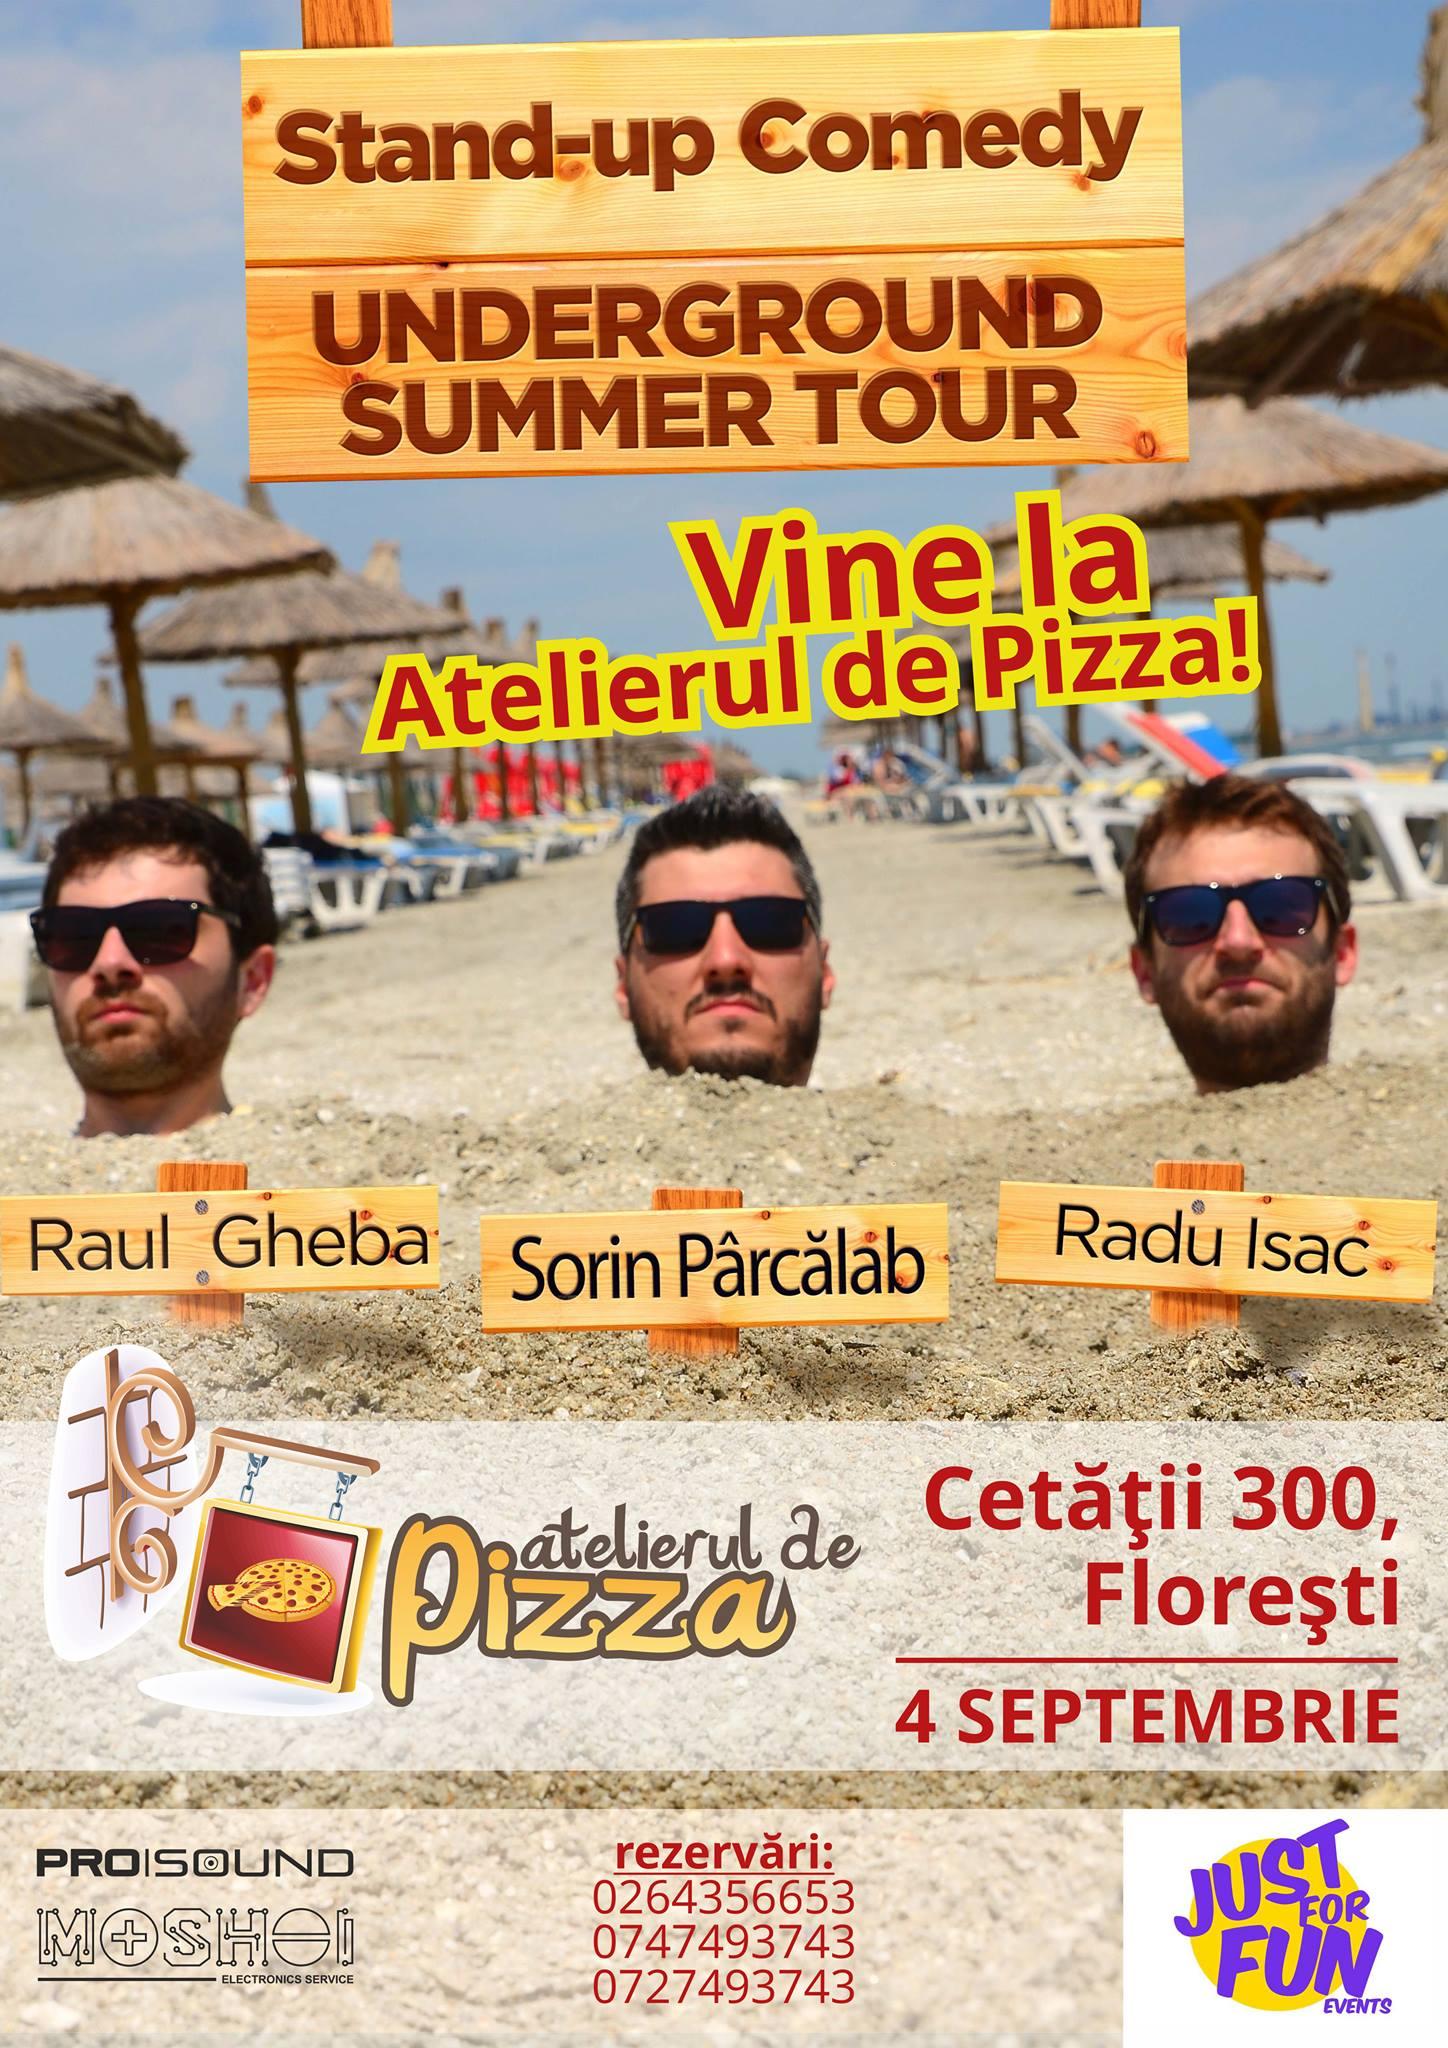 Stand-up Comedy cu Raul Gheba, Sorin Parcalab și Radu Isac